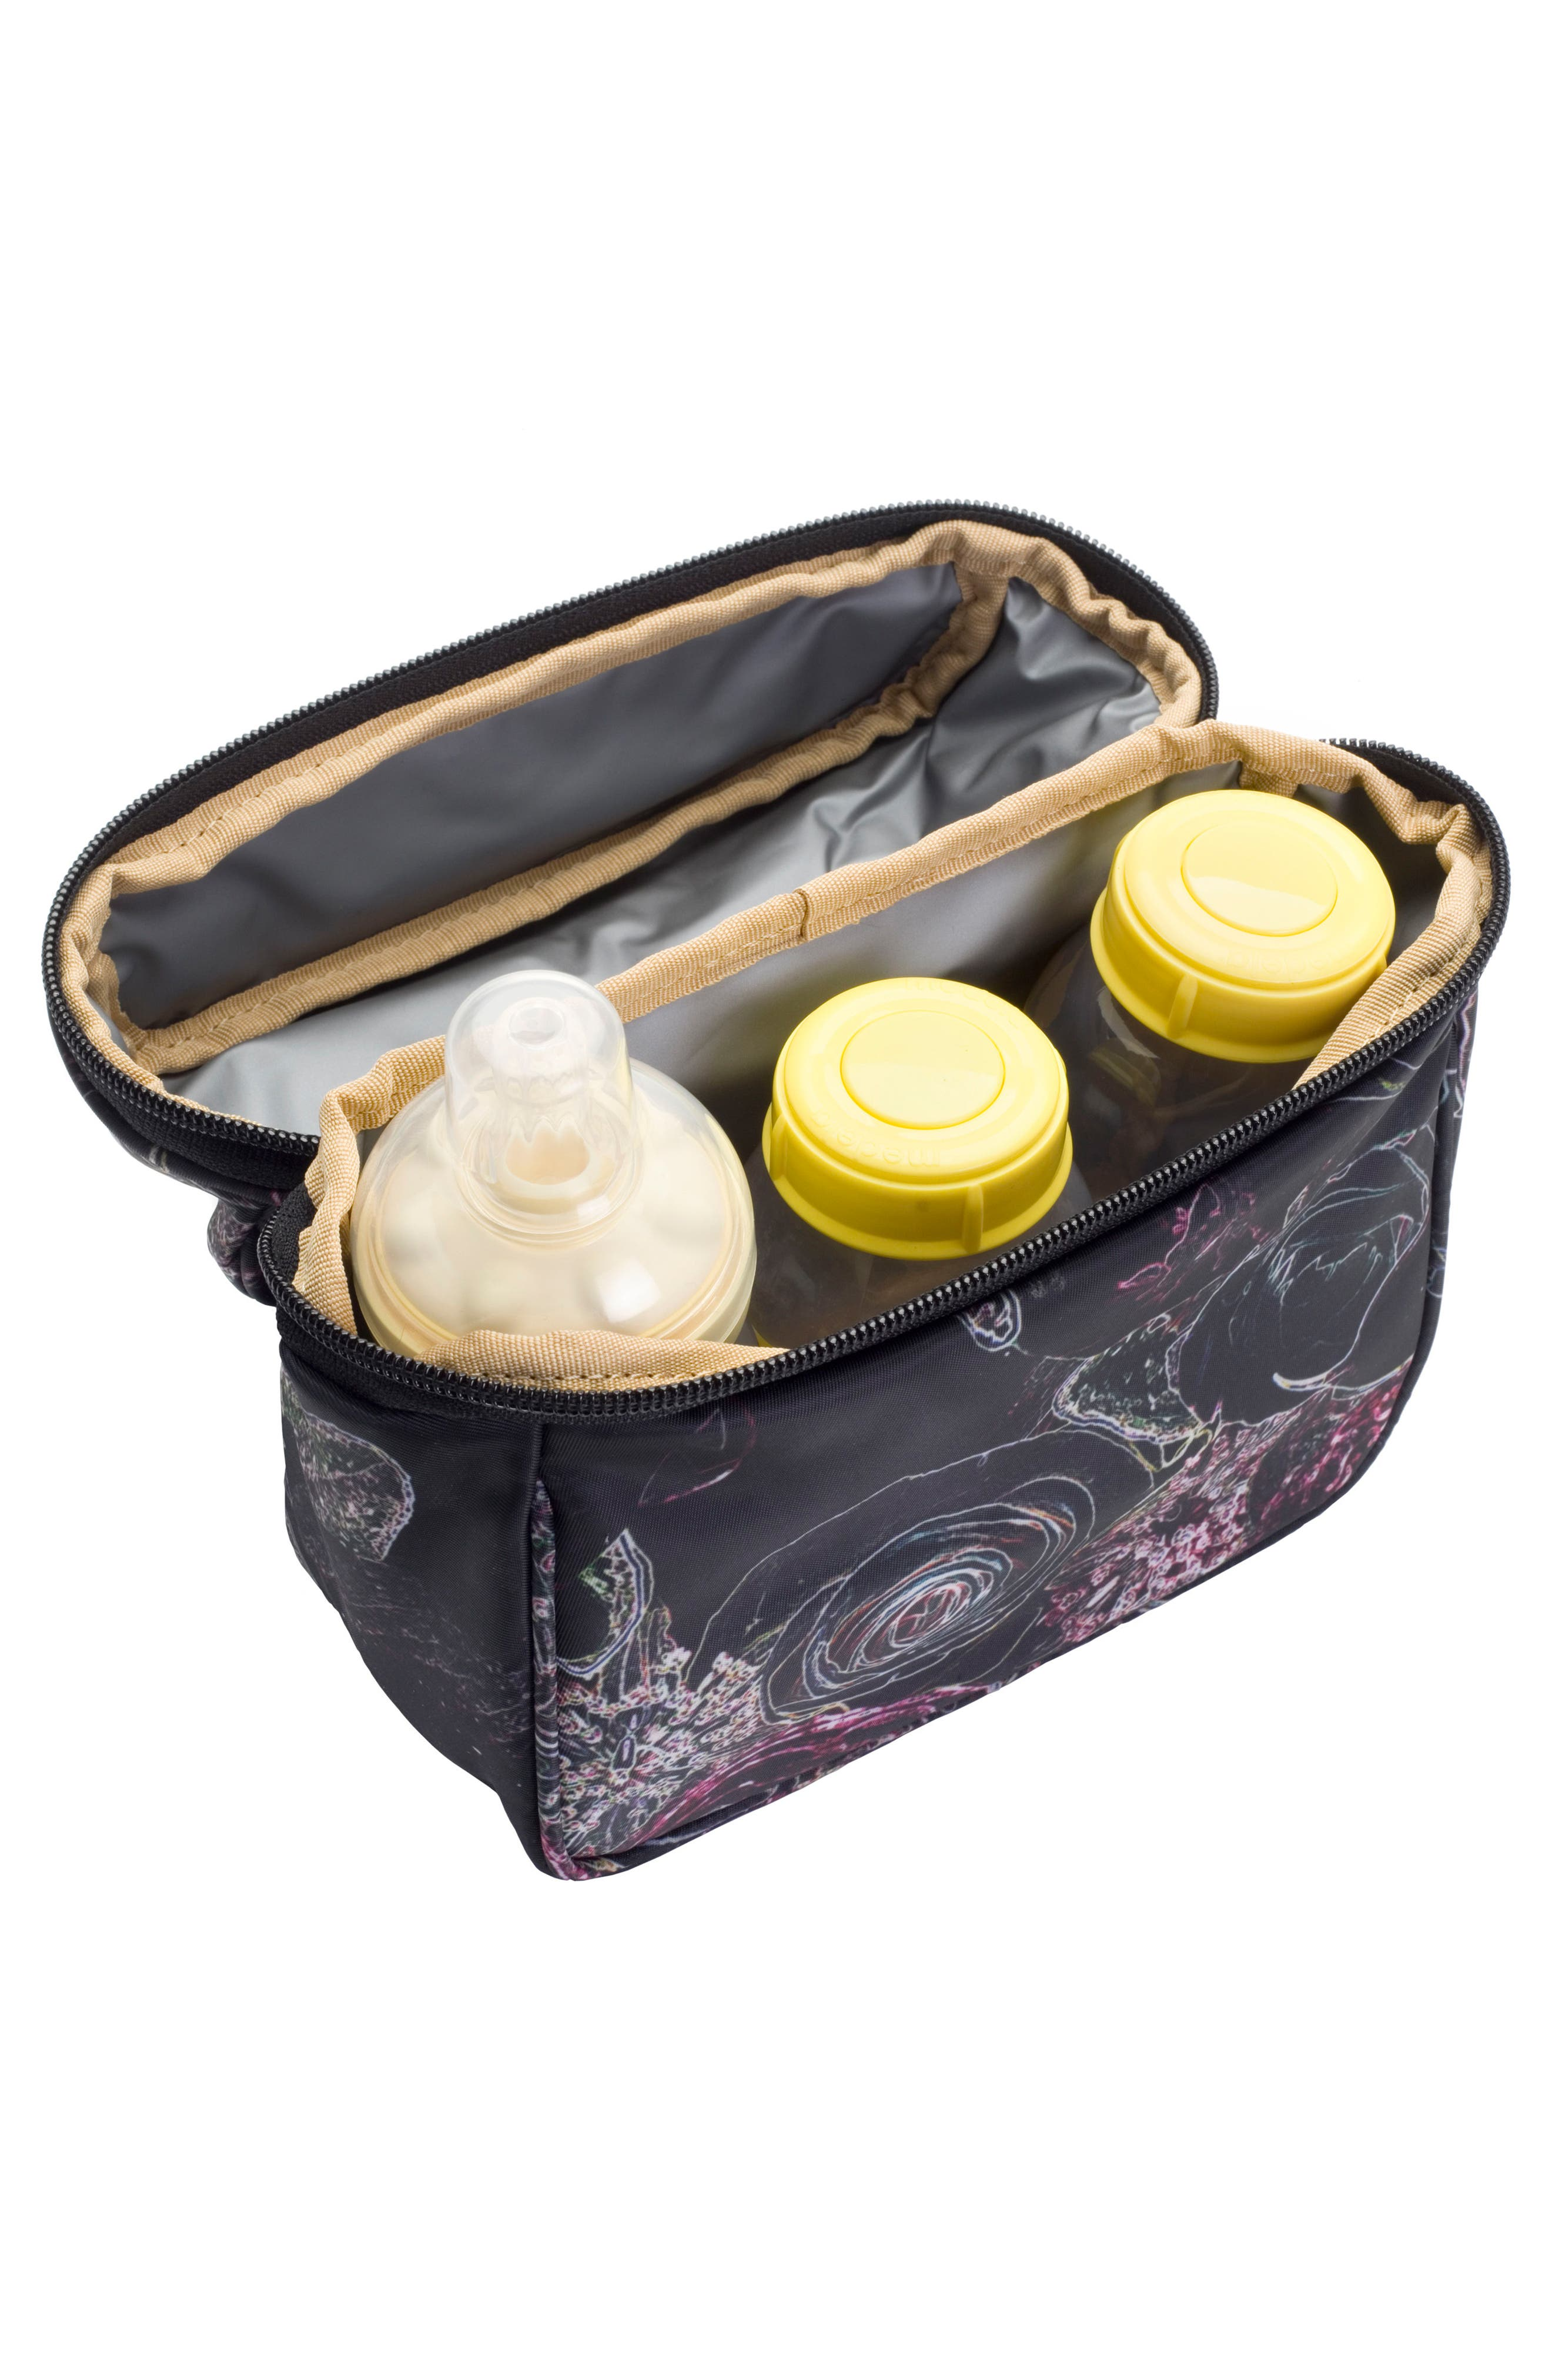 Hero Water Resistant Nylon Backpack Diaper Bag,                             Alternate thumbnail 16, color,                             Neon Floral